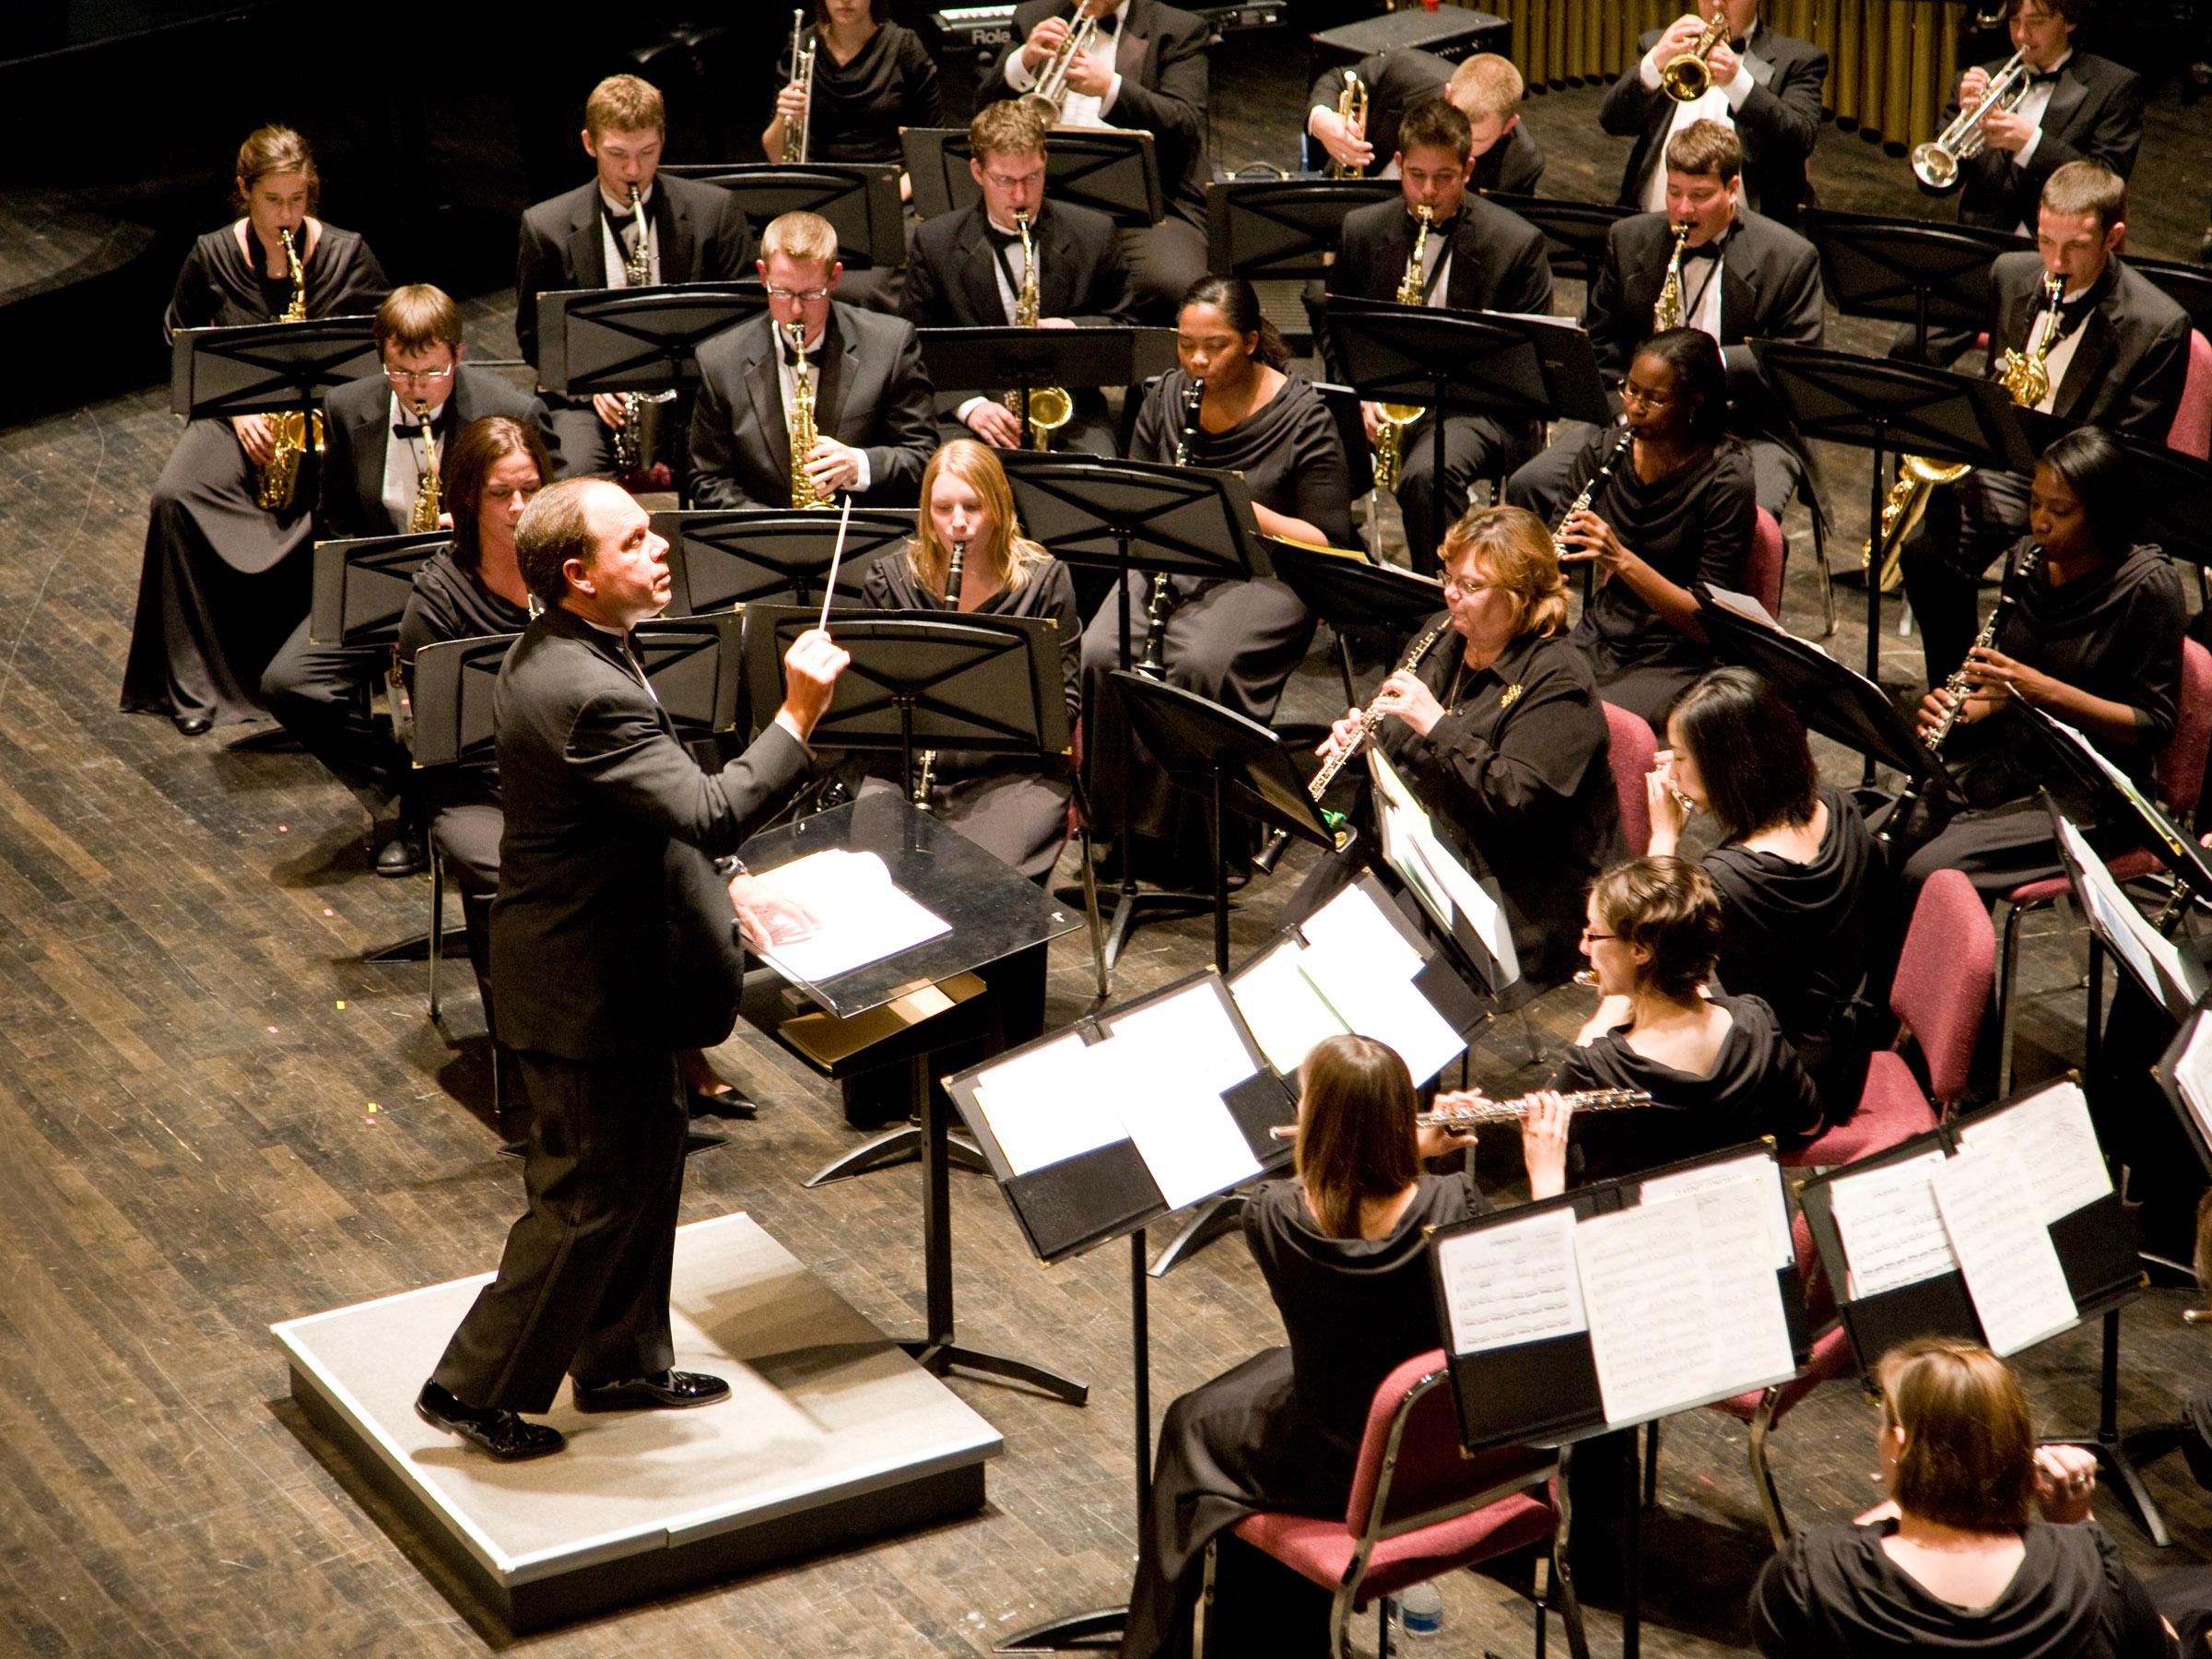 umsl-symphonic-band_6126